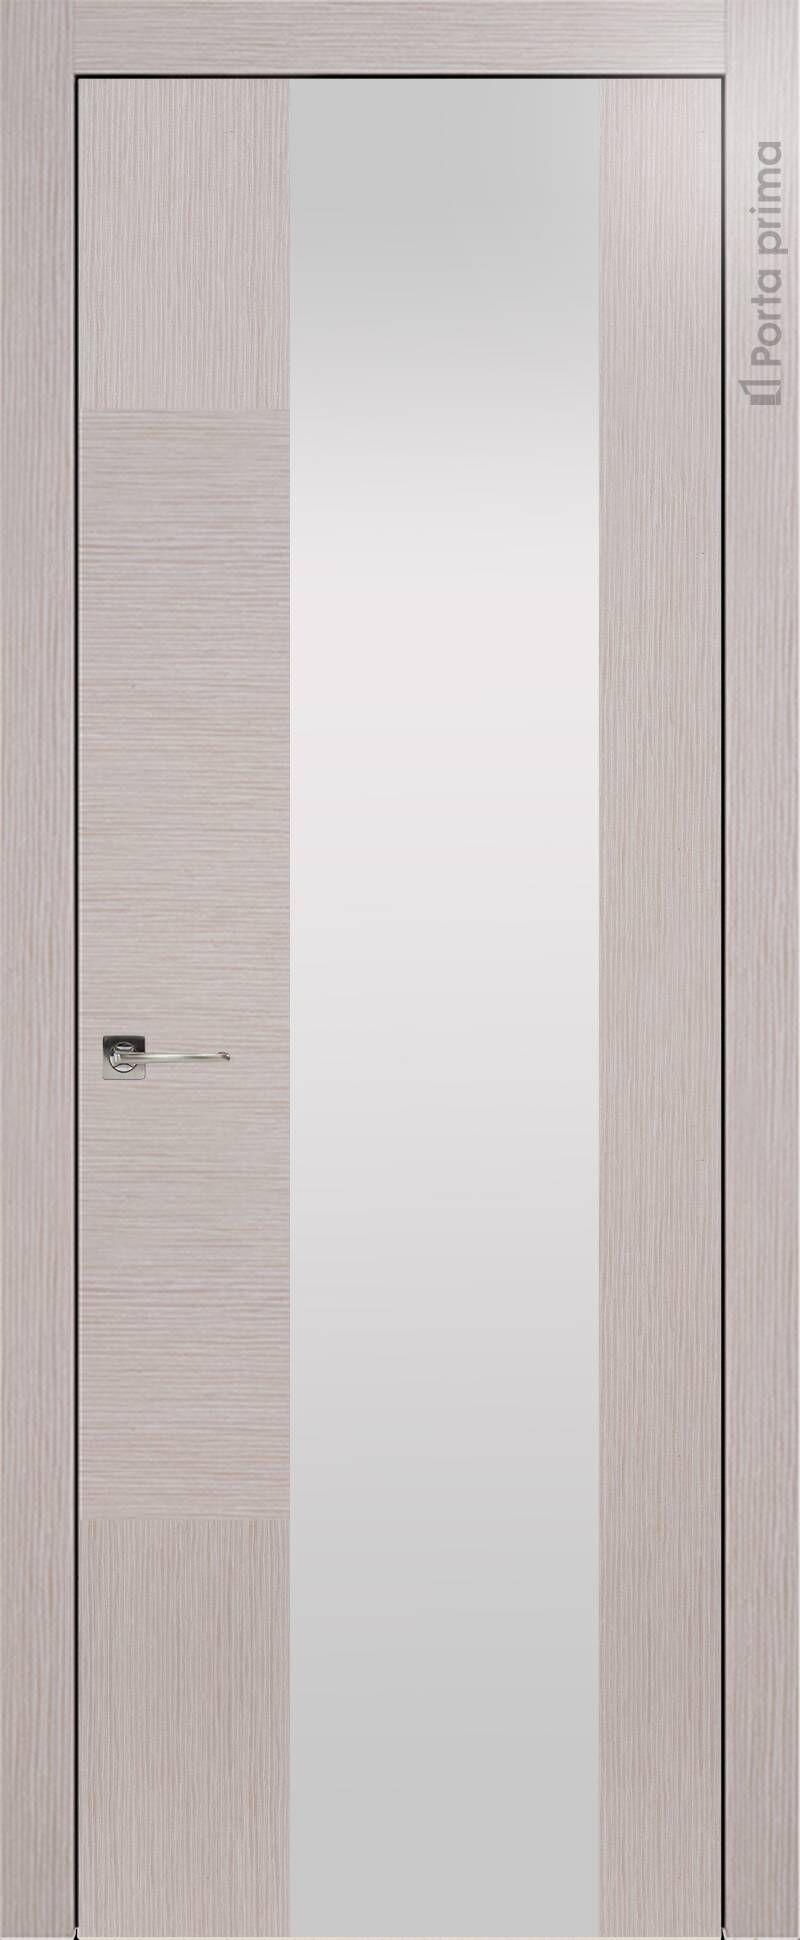 Tivoli Е-1 цвет - Дымчатый дуб Со стеклом (ДО)